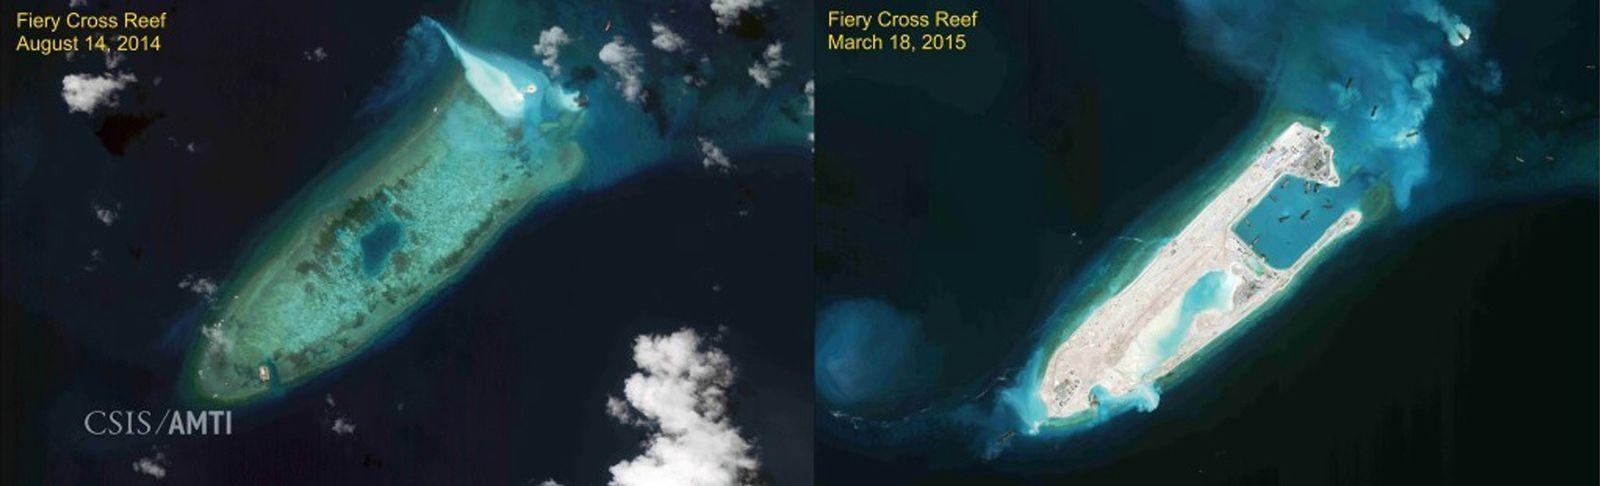 China/ Fiery Cross Reef/ Landebahn